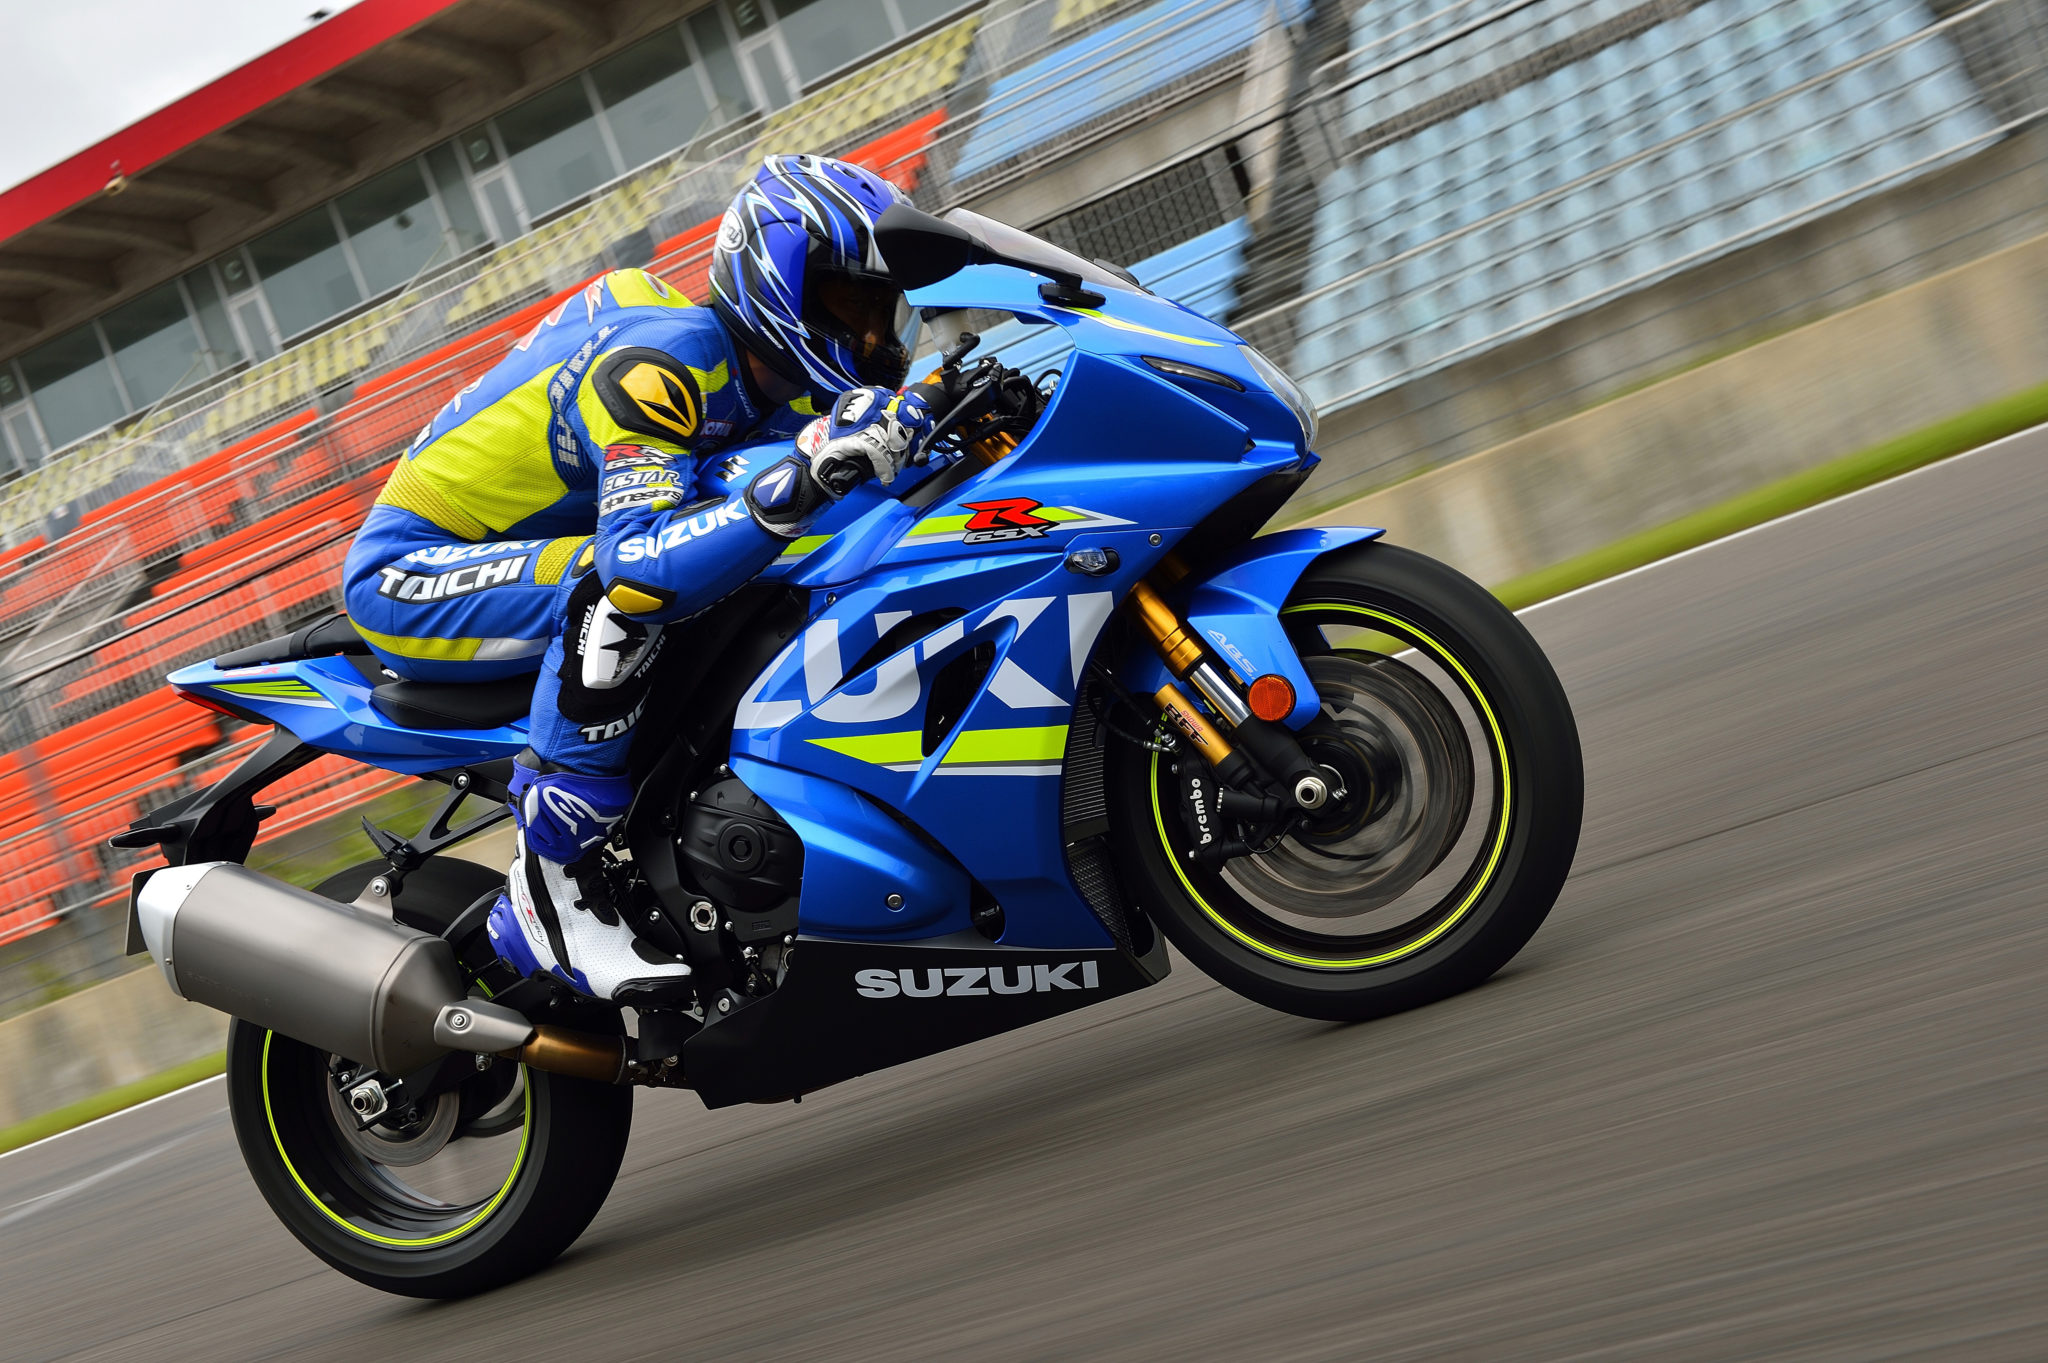 Suzuki releases 2017 lineup | Powersports Business